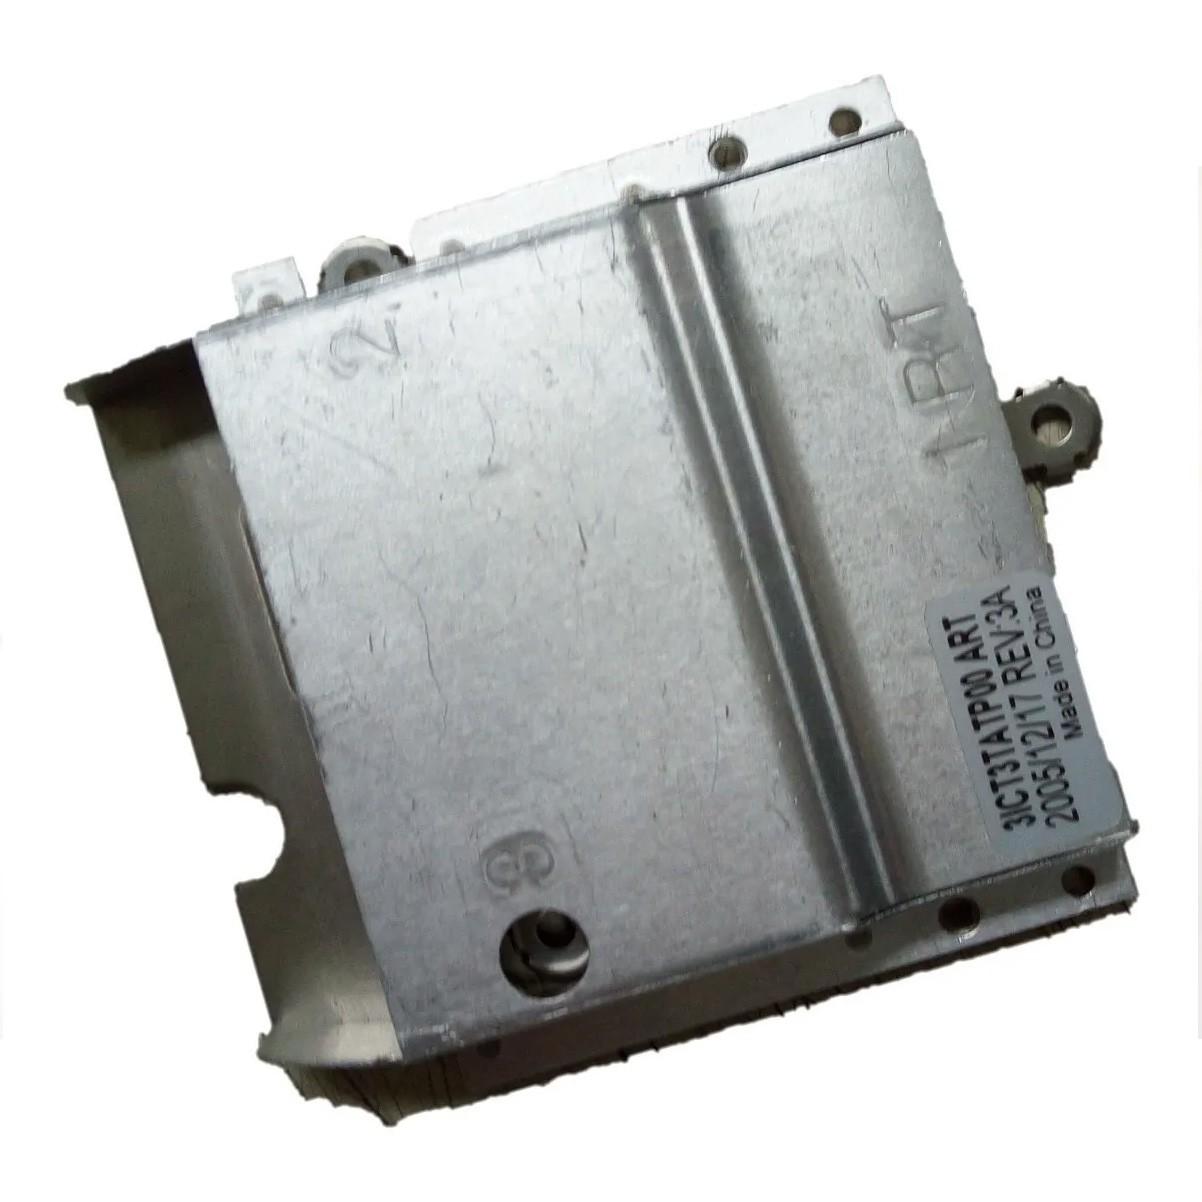 Dissipador BGA P/ Notebook Hp Dv1000 V2000 PN:3ICT3TATP00 - Retirado